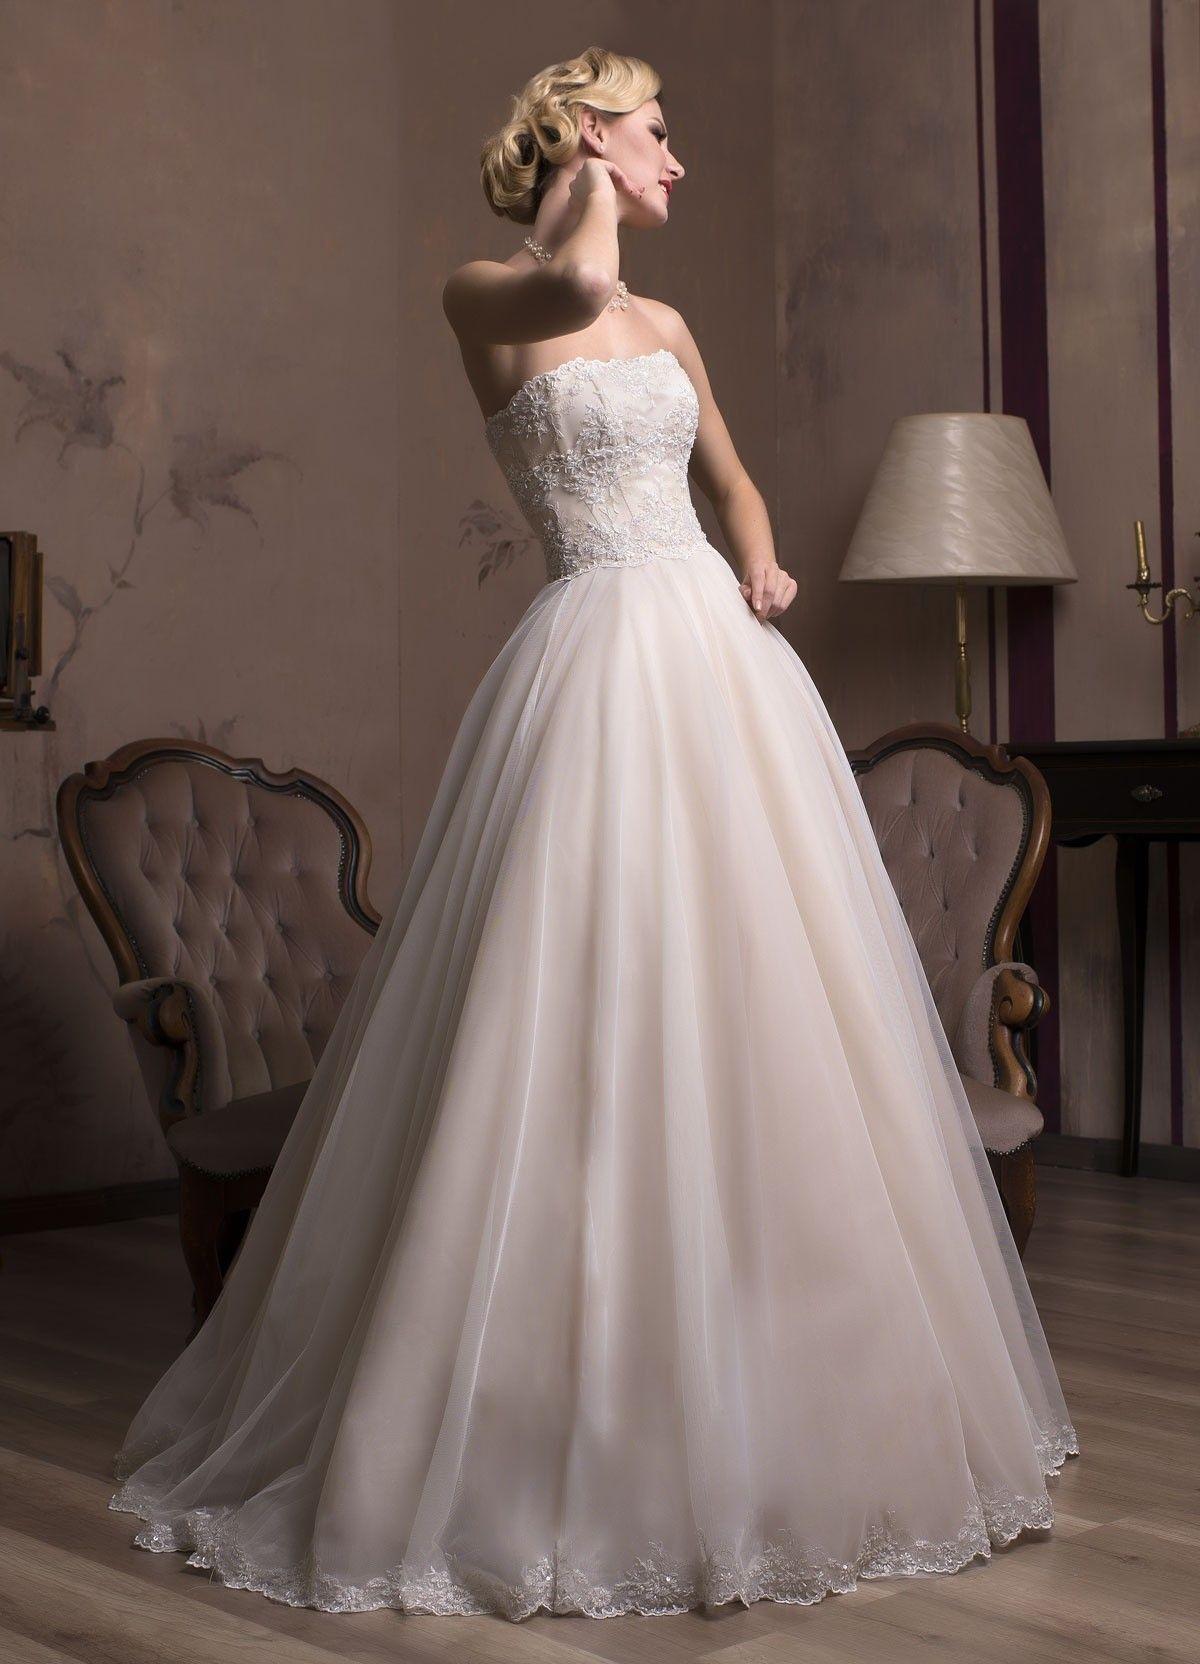 e03b17278ec2 Luxusné svadobné šaty s nádherne zdobeným korzetom a tylovou sukňou